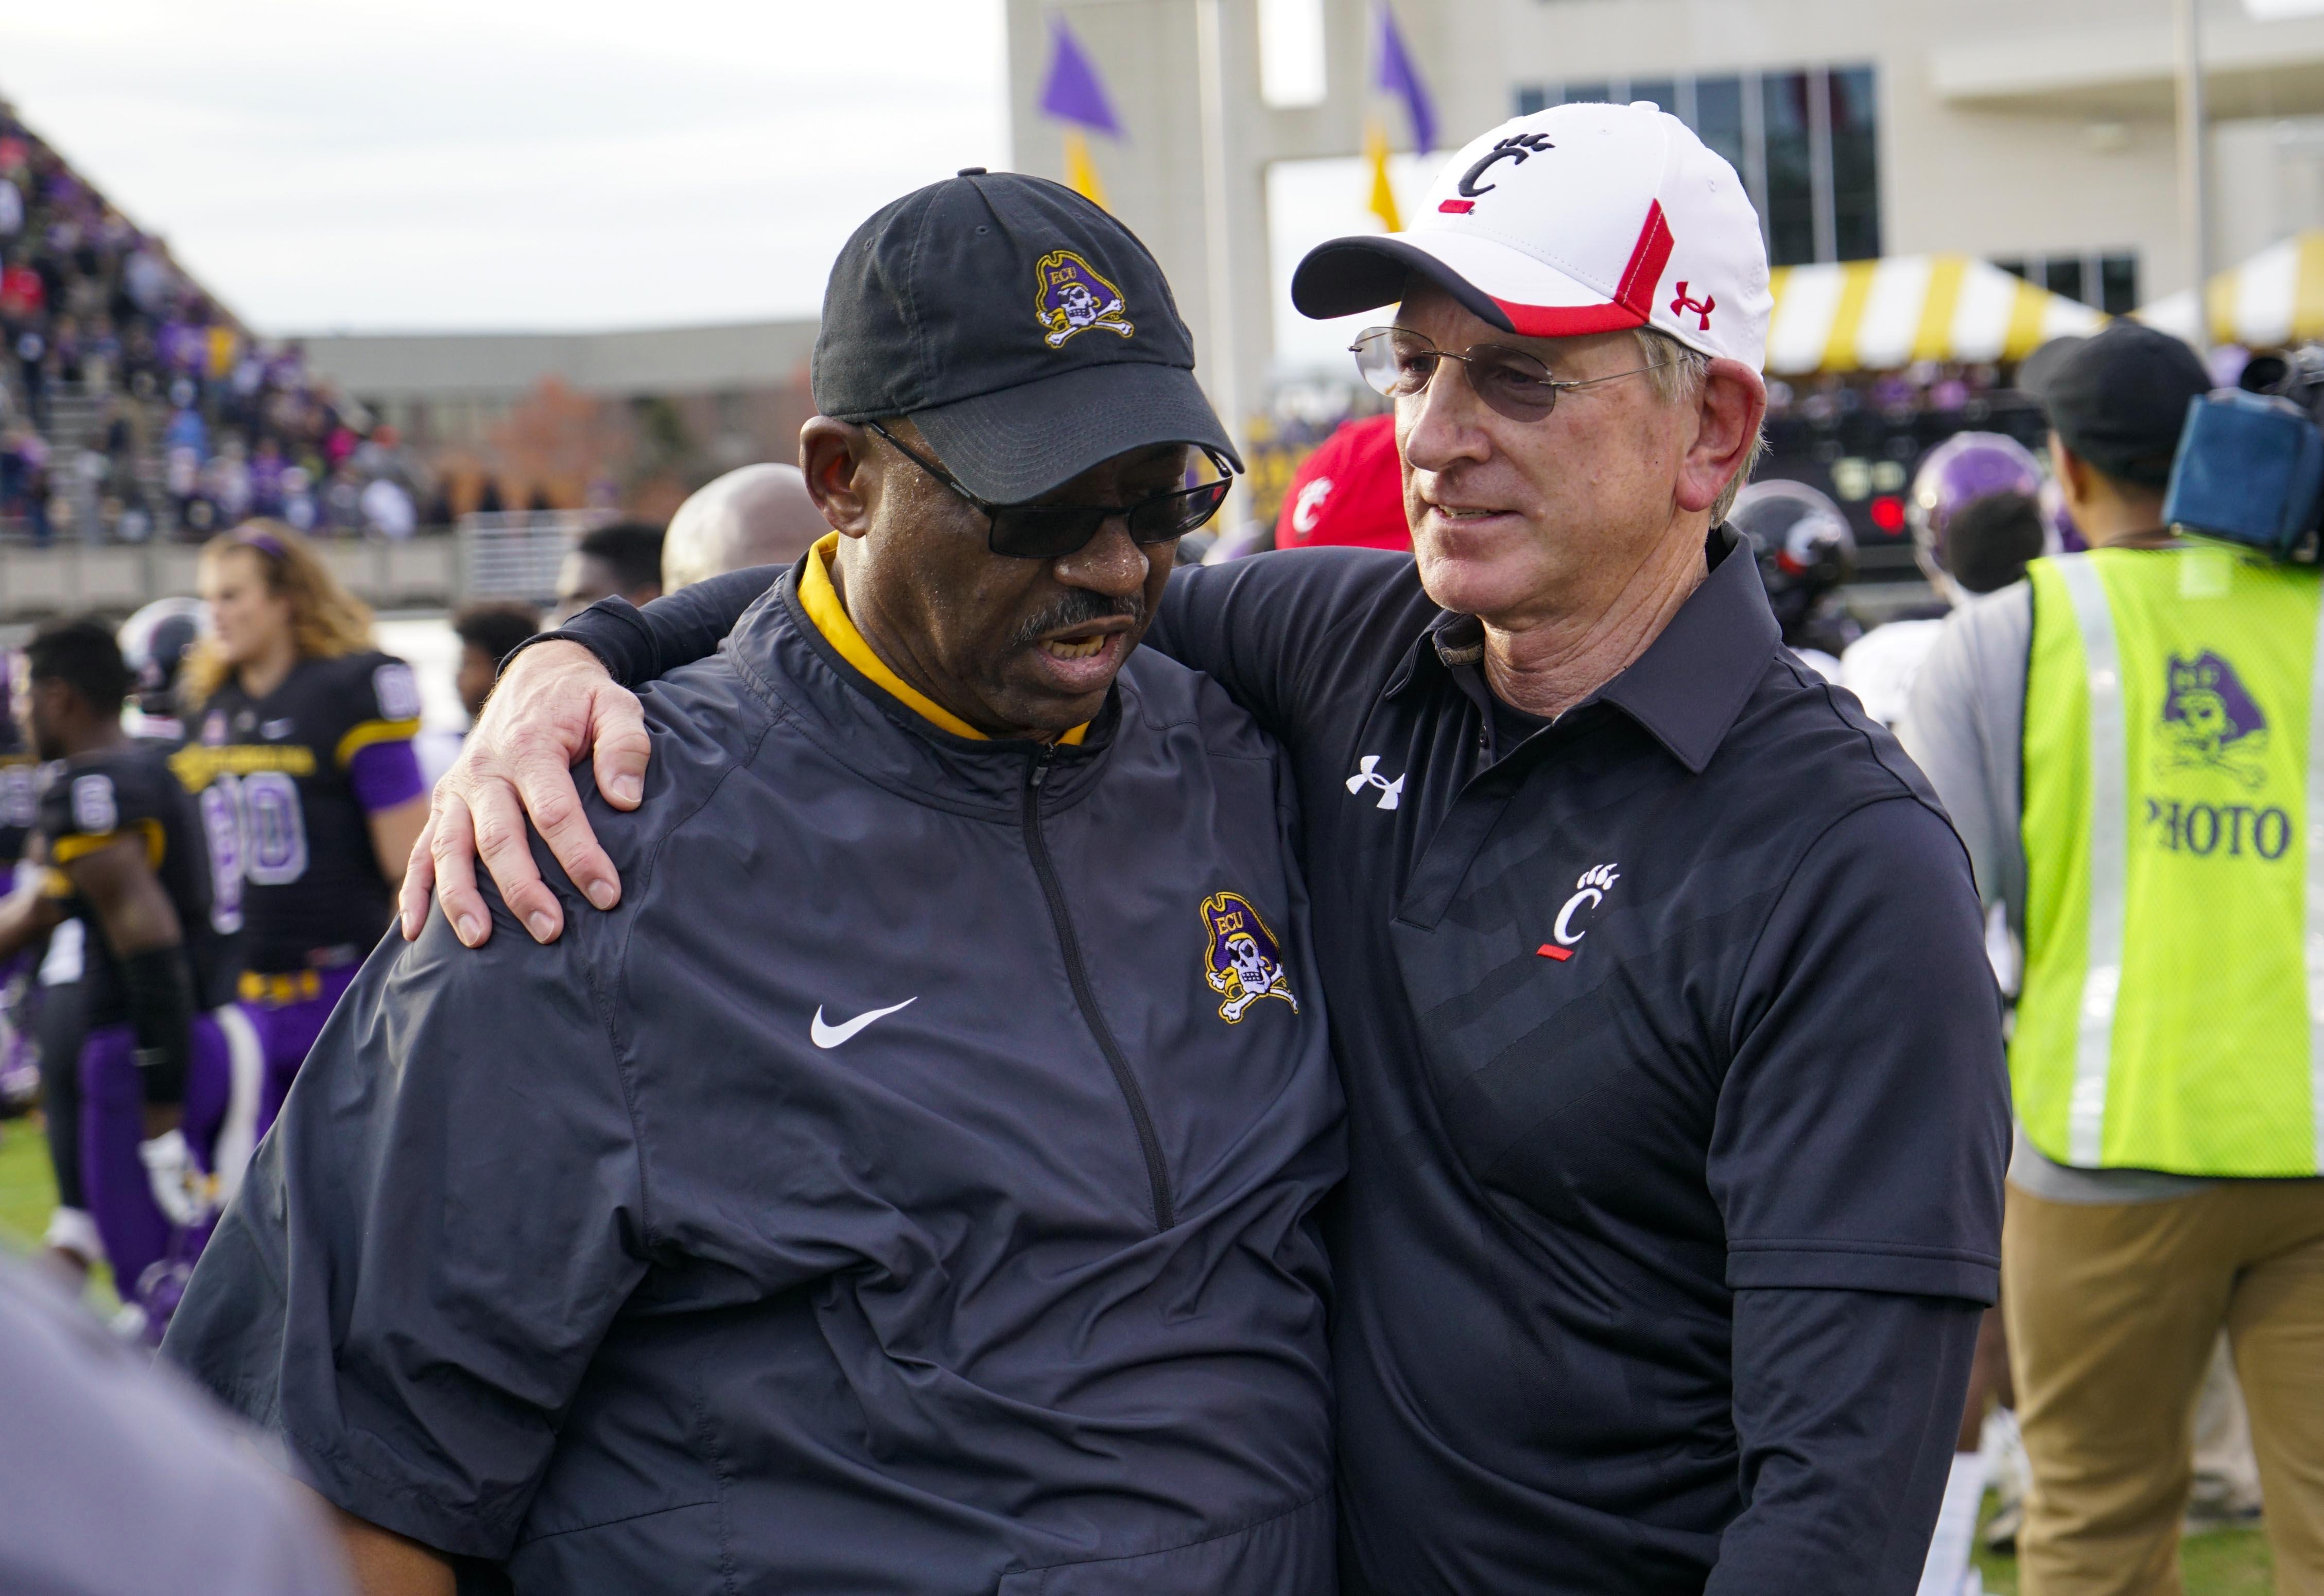 UC coach Tuberville at Eastern Carolina